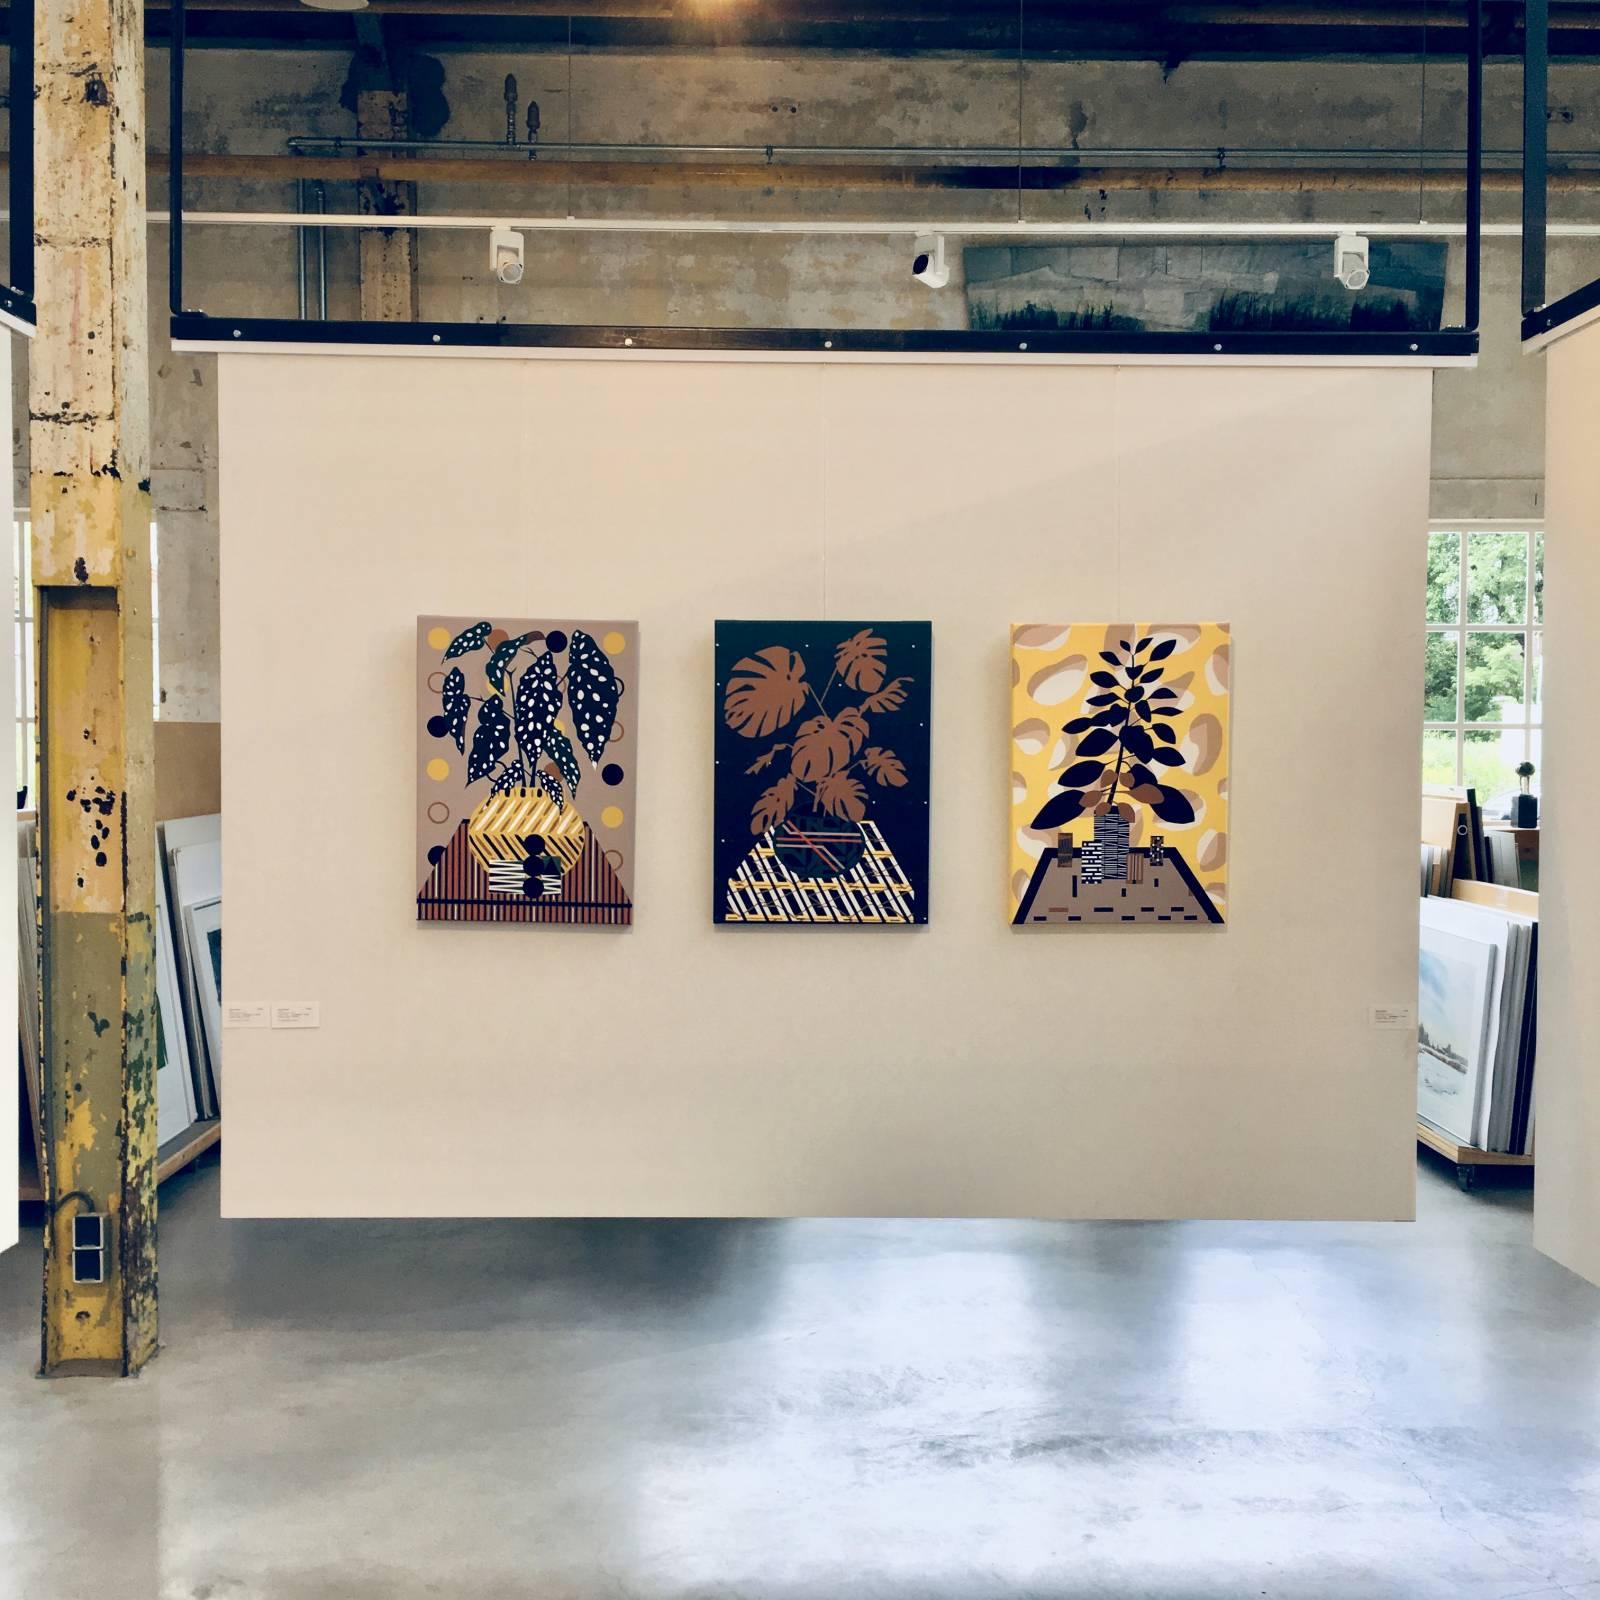 Exhibition Art Zaanstad: New Acquisitions